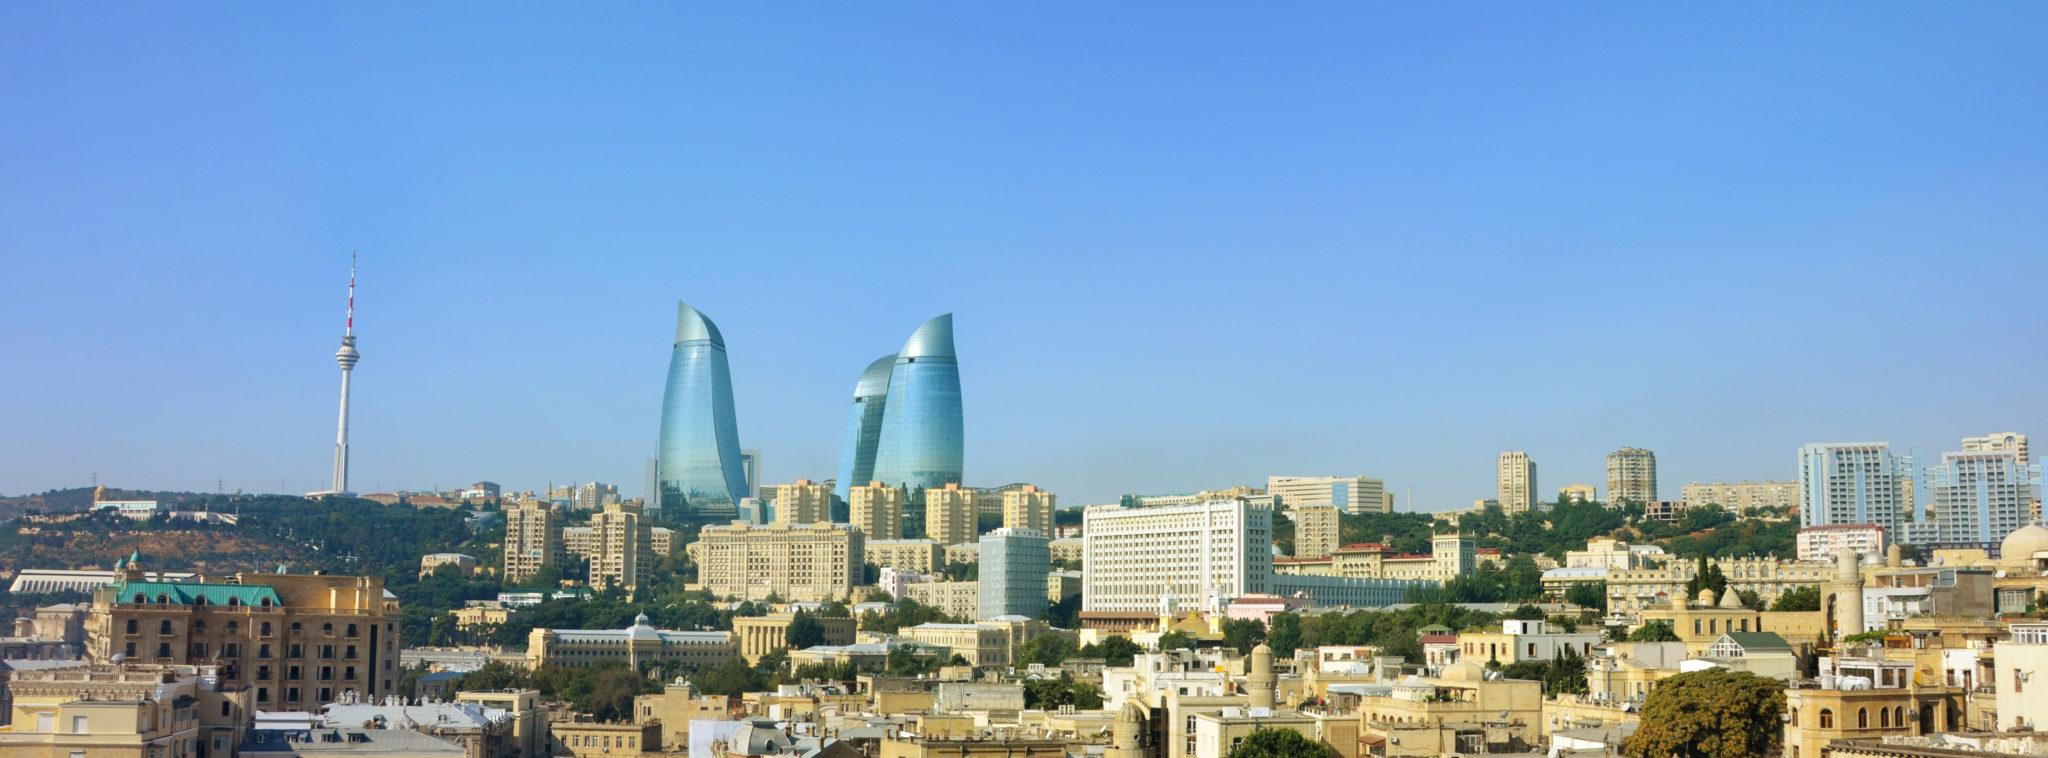 Visit-Azerbaijan-Baku-Skyline-Slider